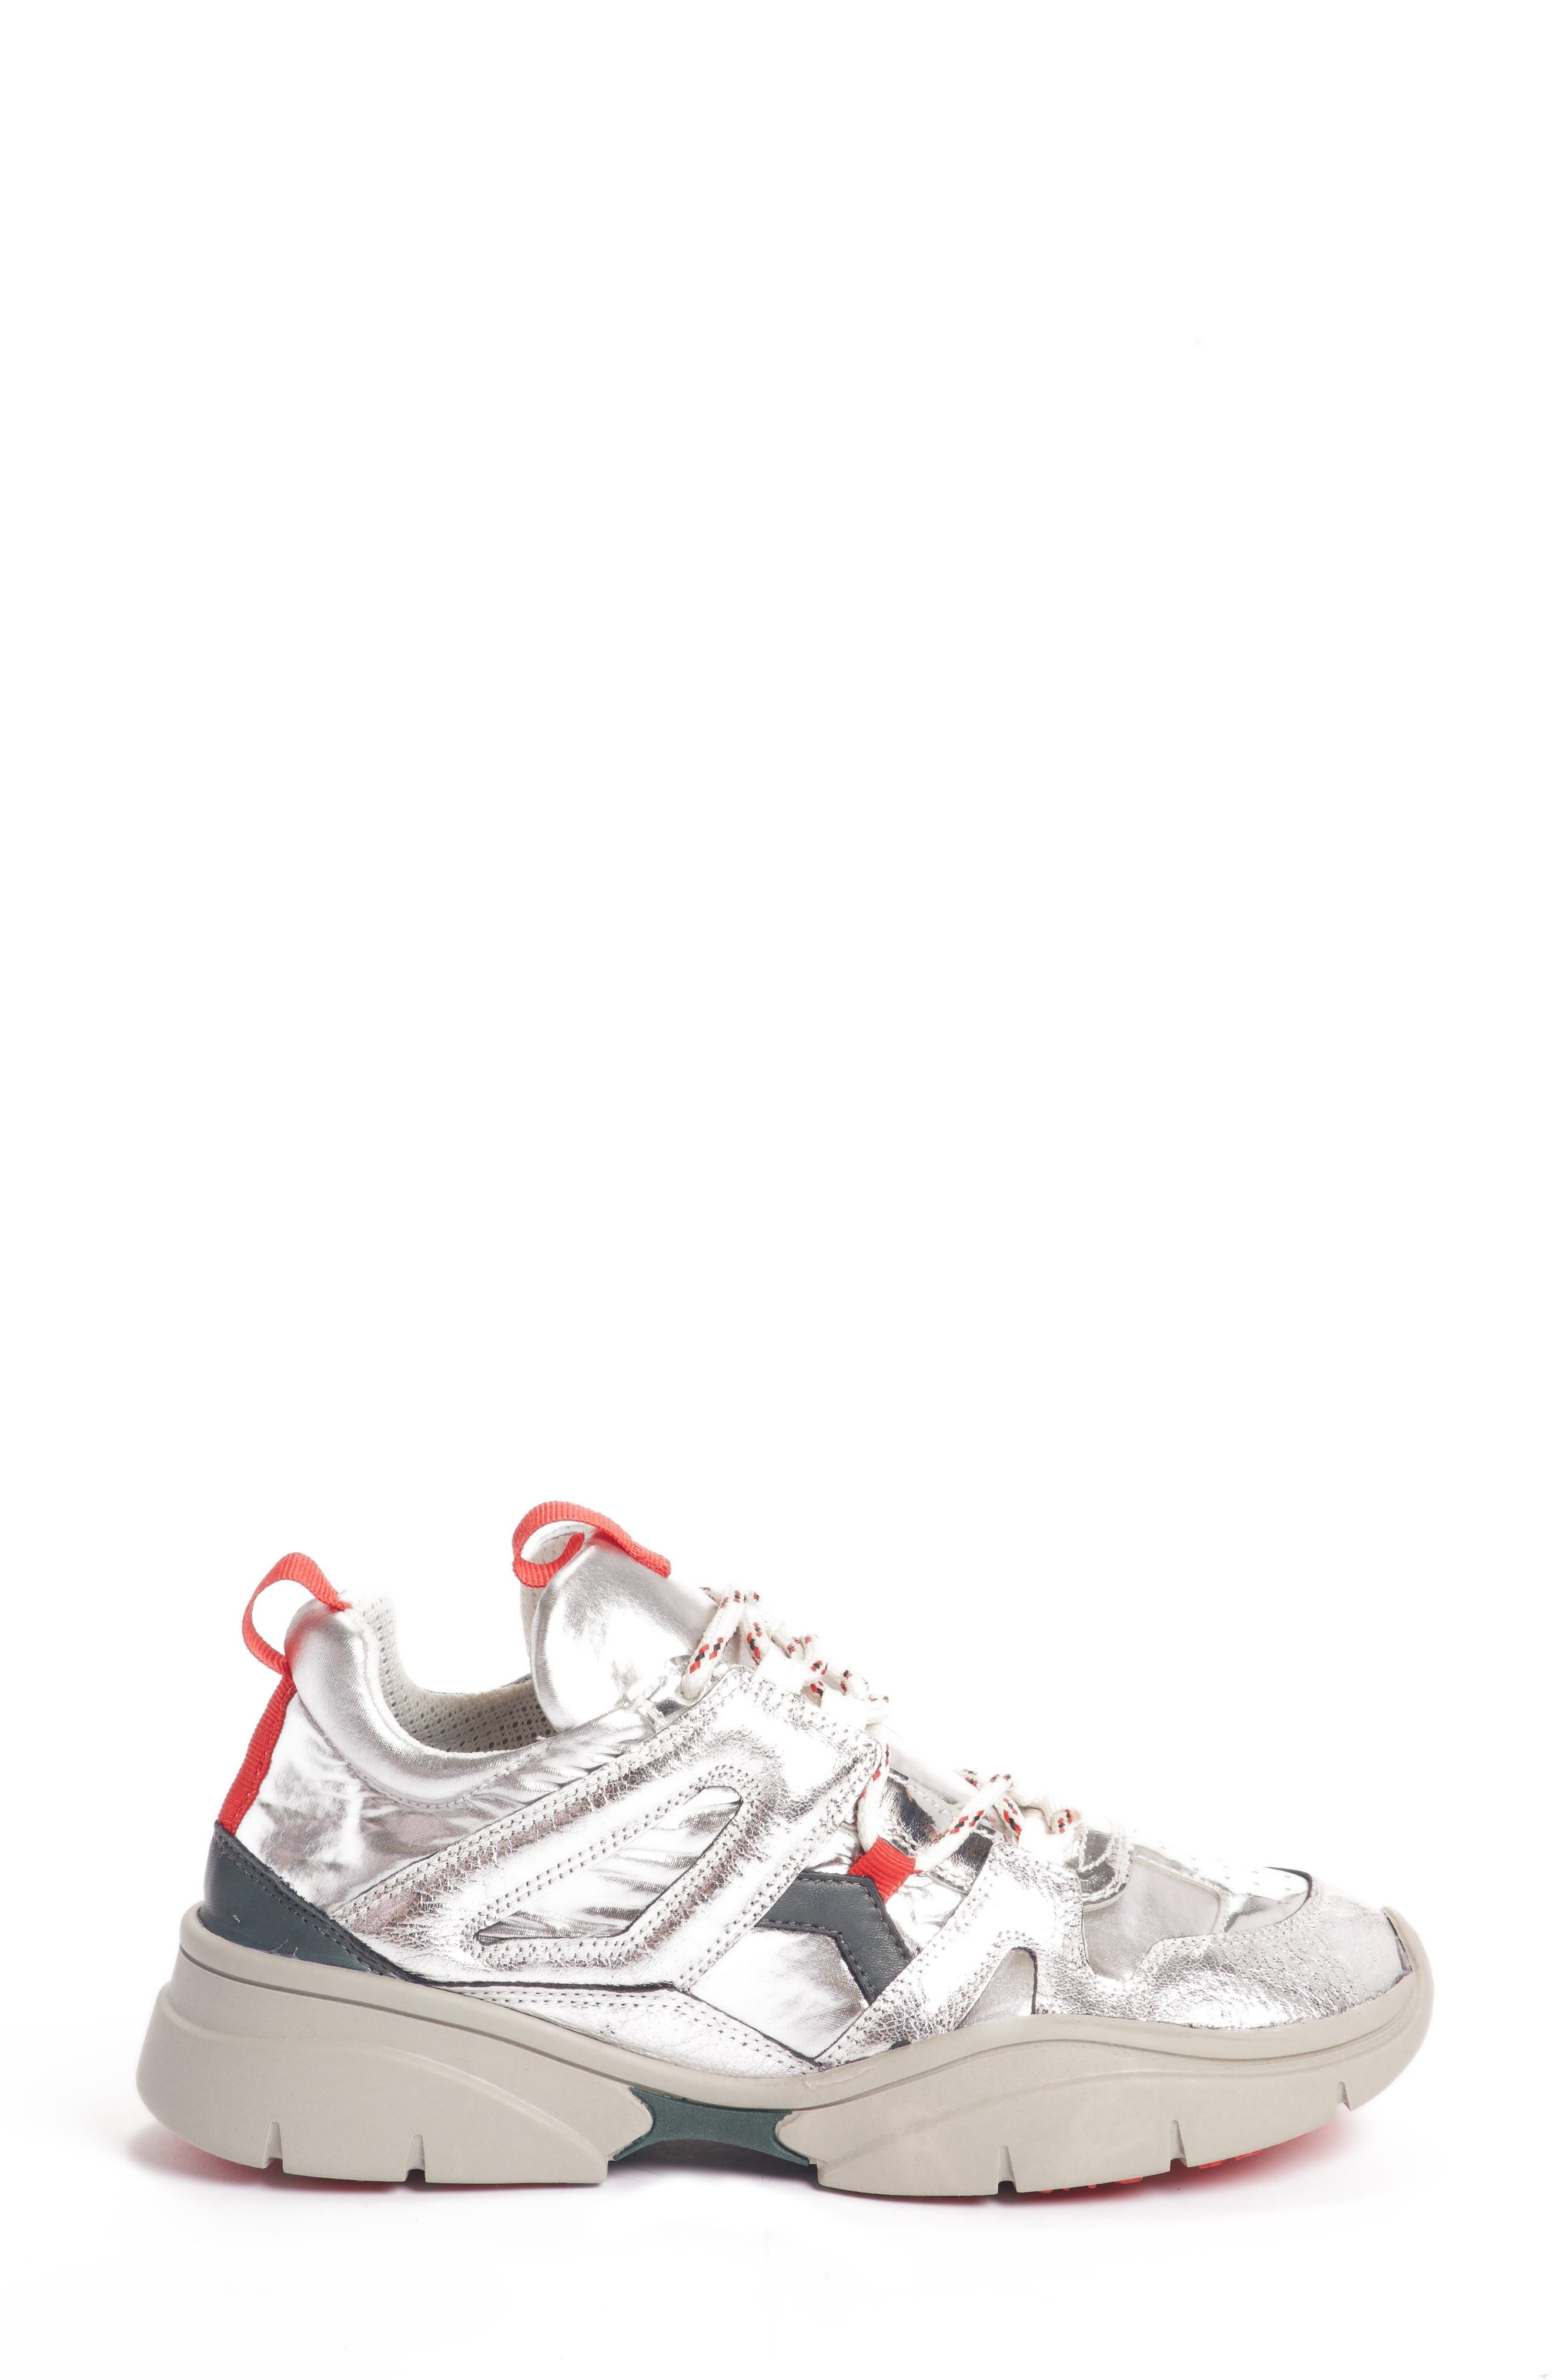 Kindsay Sneaker,                             Alternate thumbnail 3, color,                             040